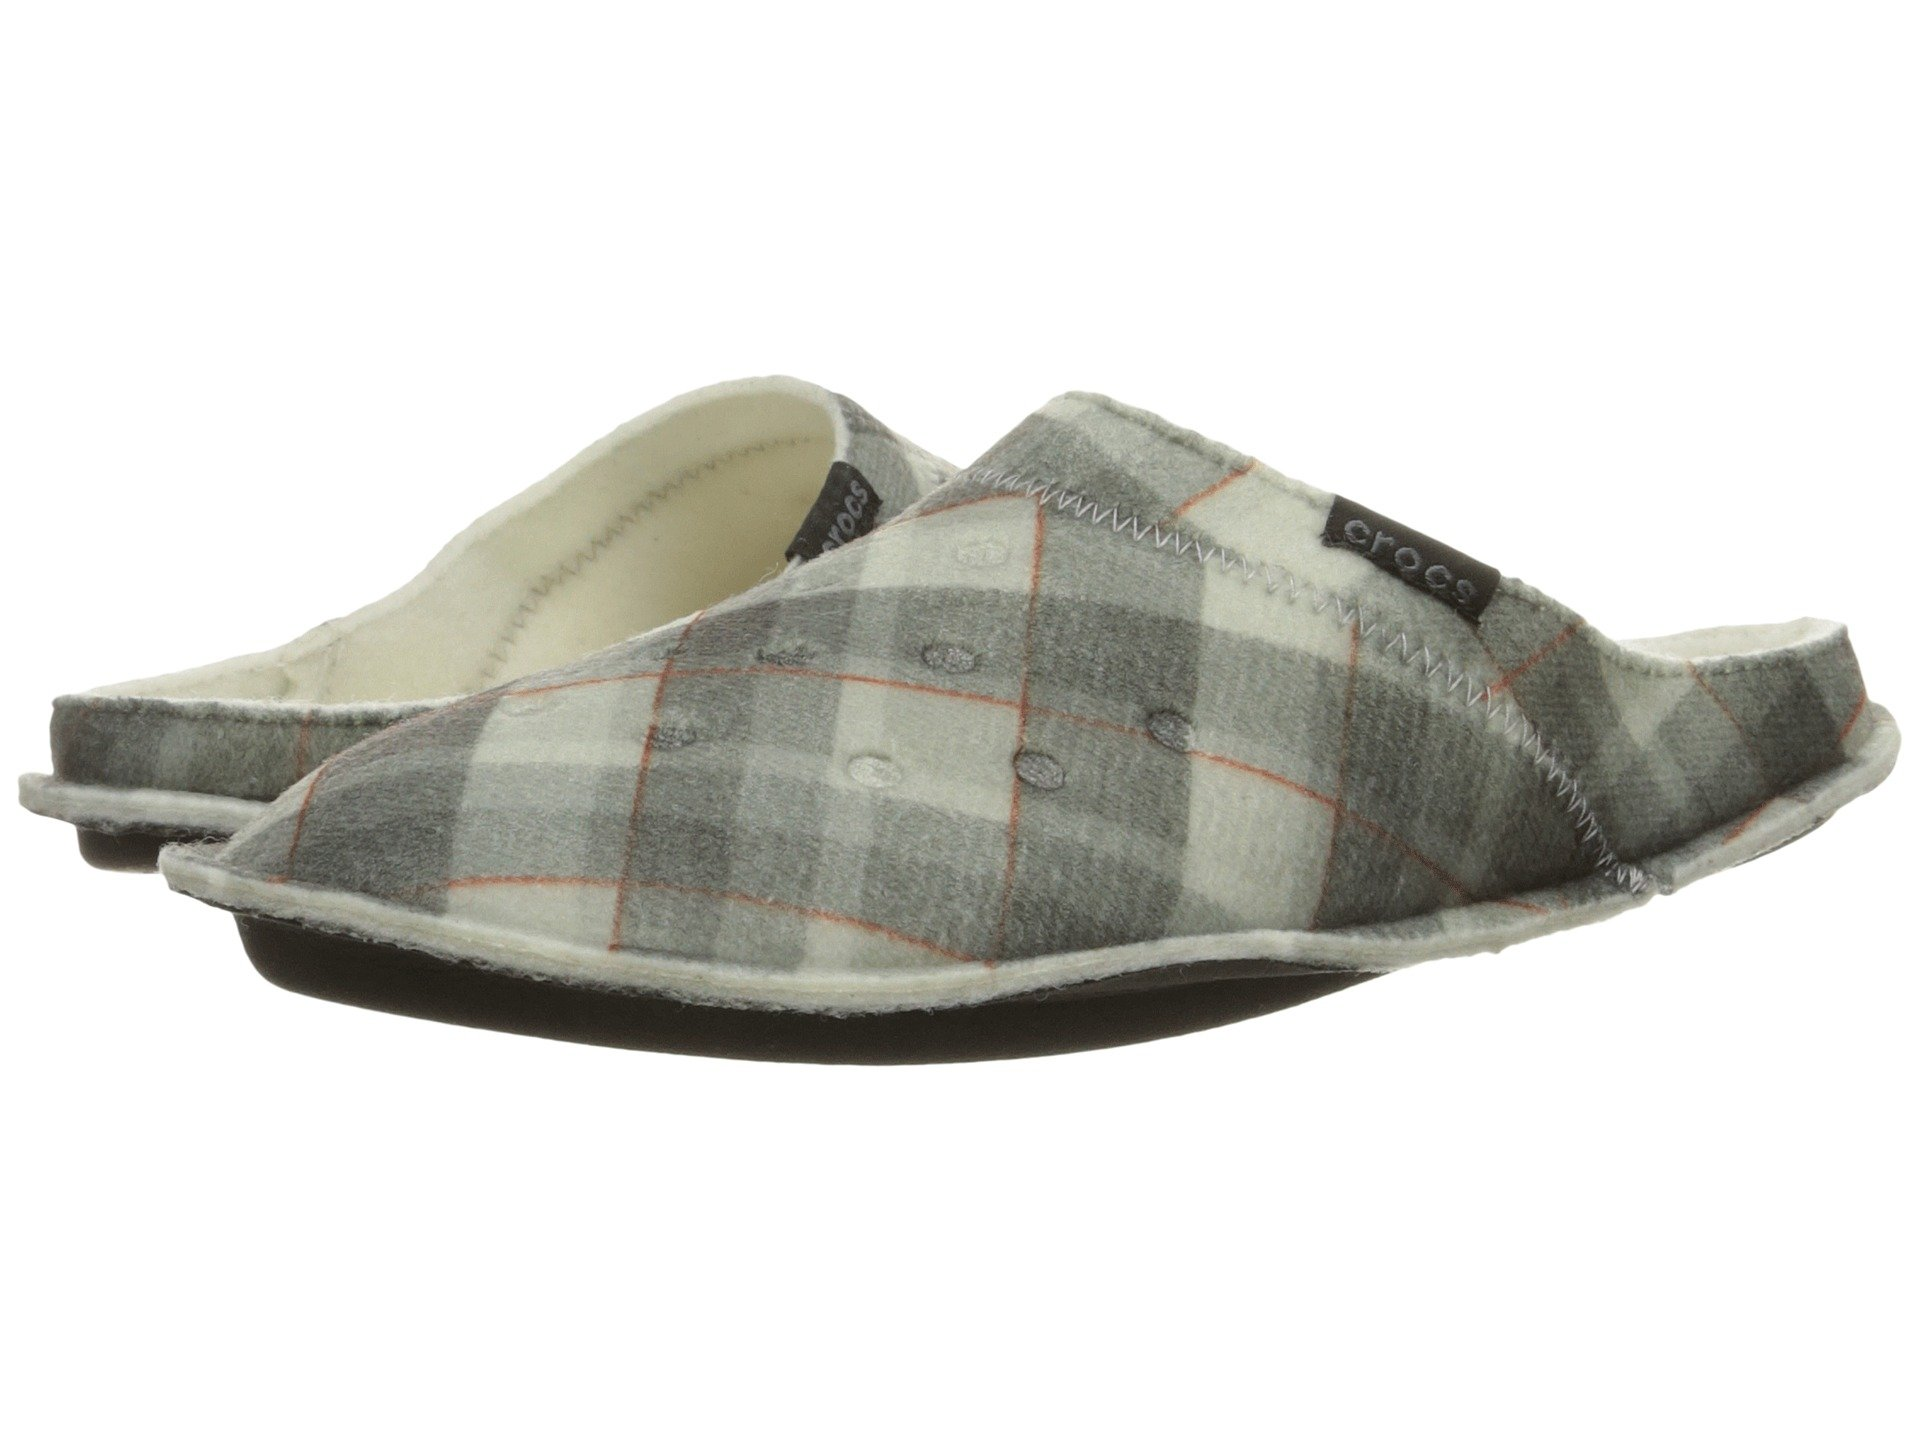 Zapatos de Descanso para Hombre Crocs Classic Plaid Slipper  + Crocs en VeoyCompro.net